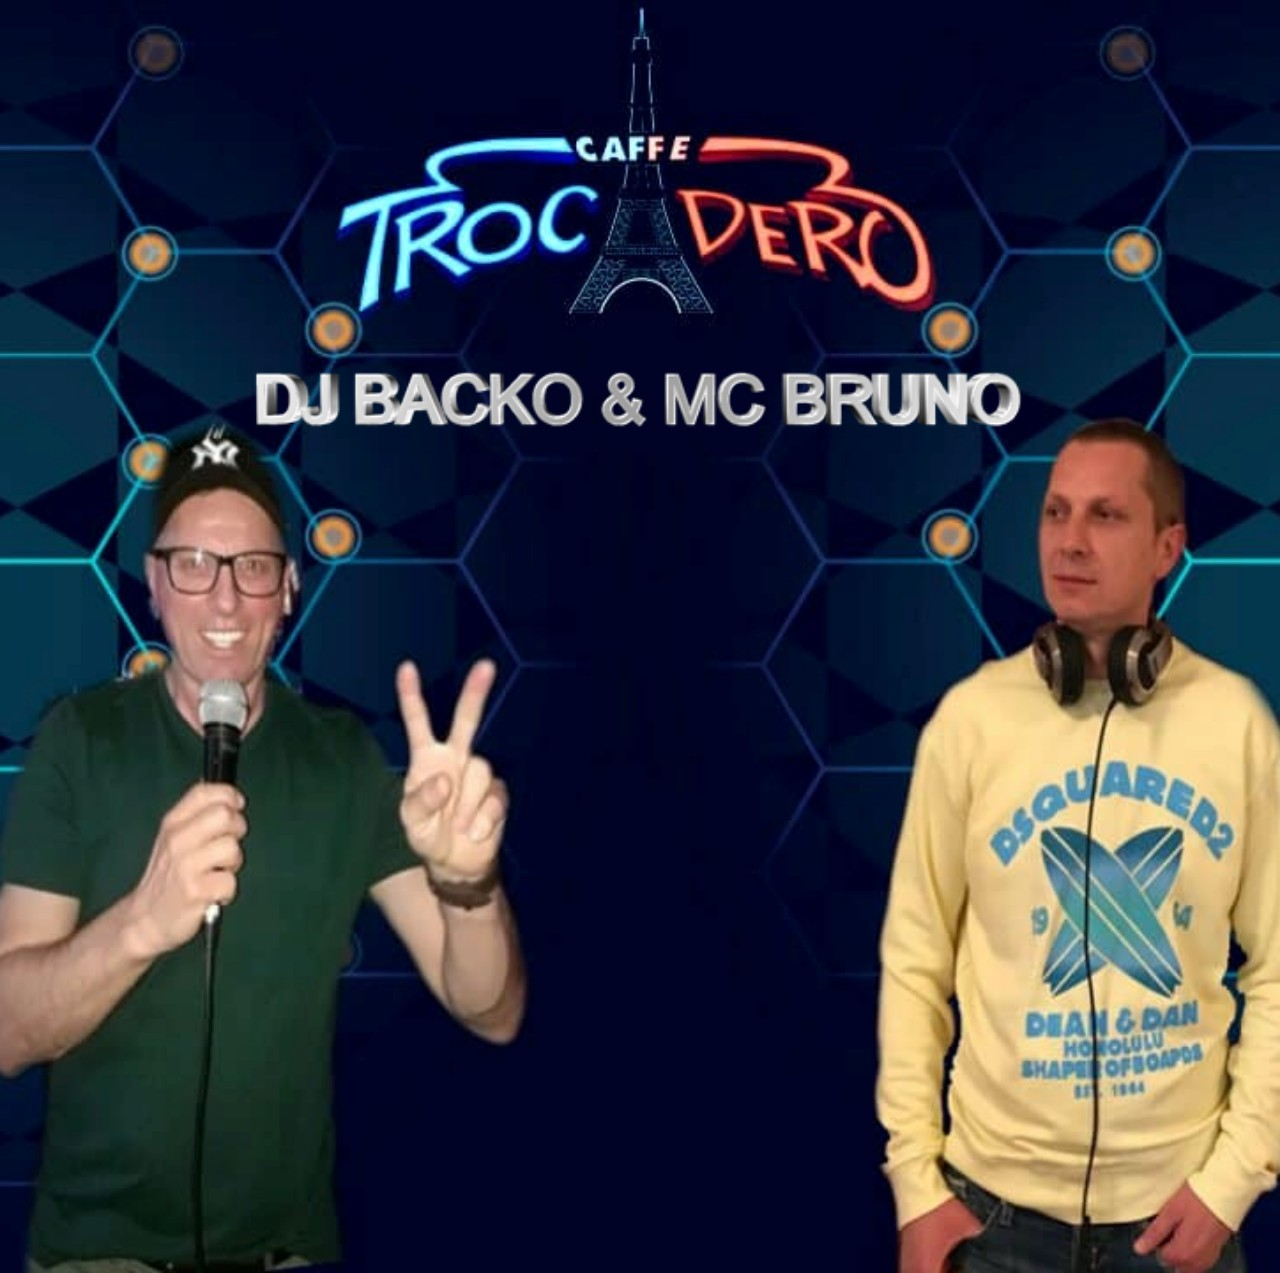 DJ Backo